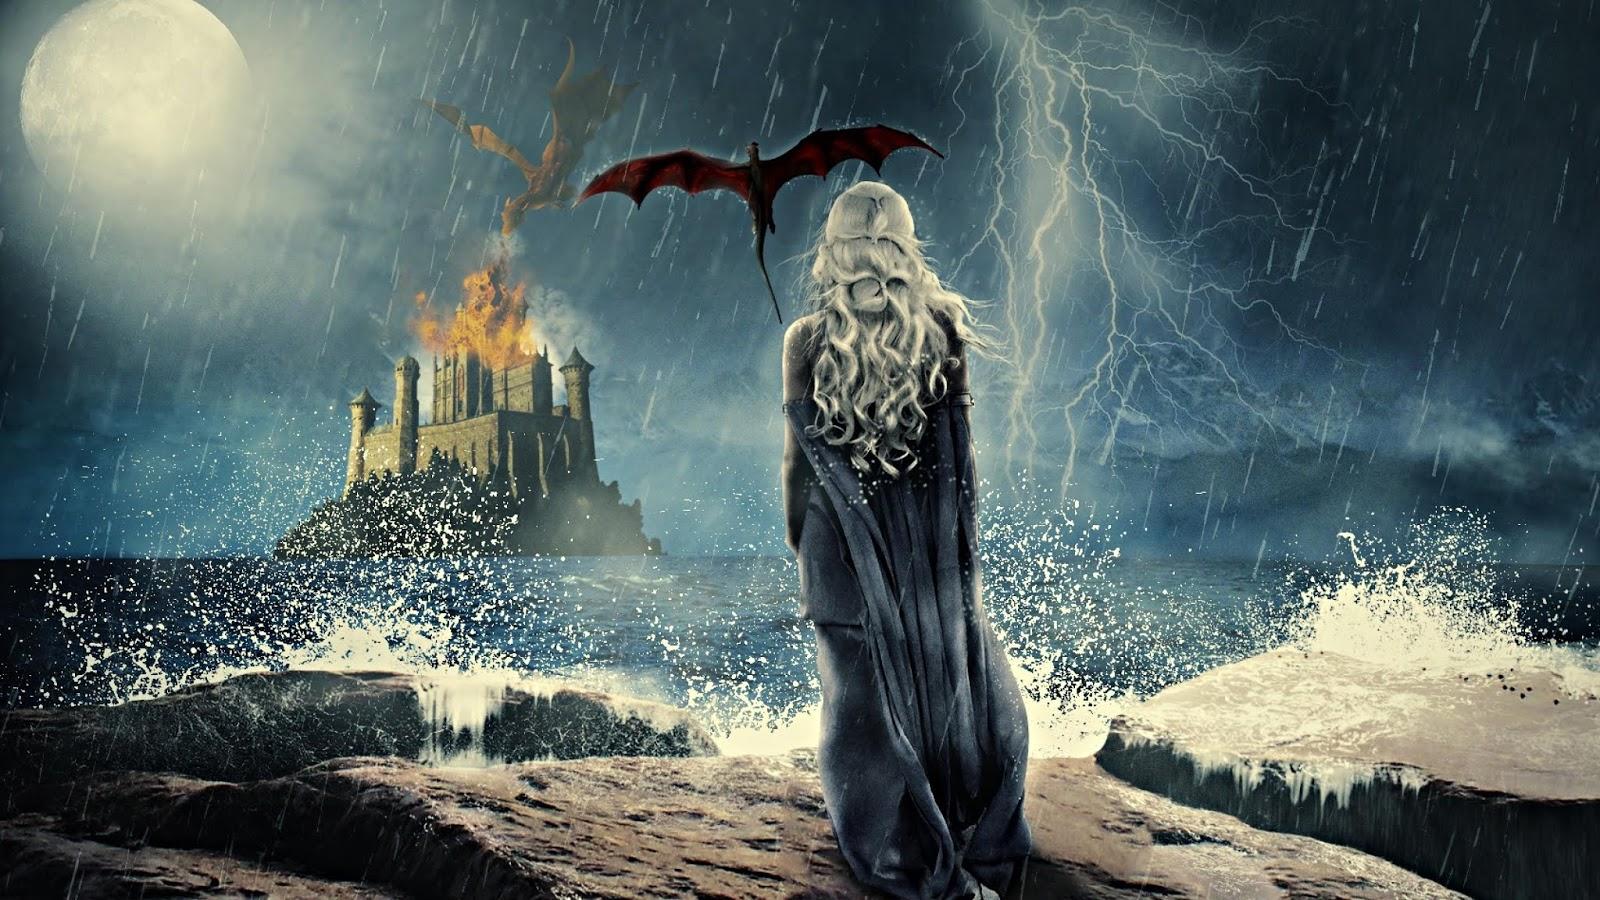 Game Of Thrones Ultra Hd 4k Wallpapers خلفيات مسلسل صراع